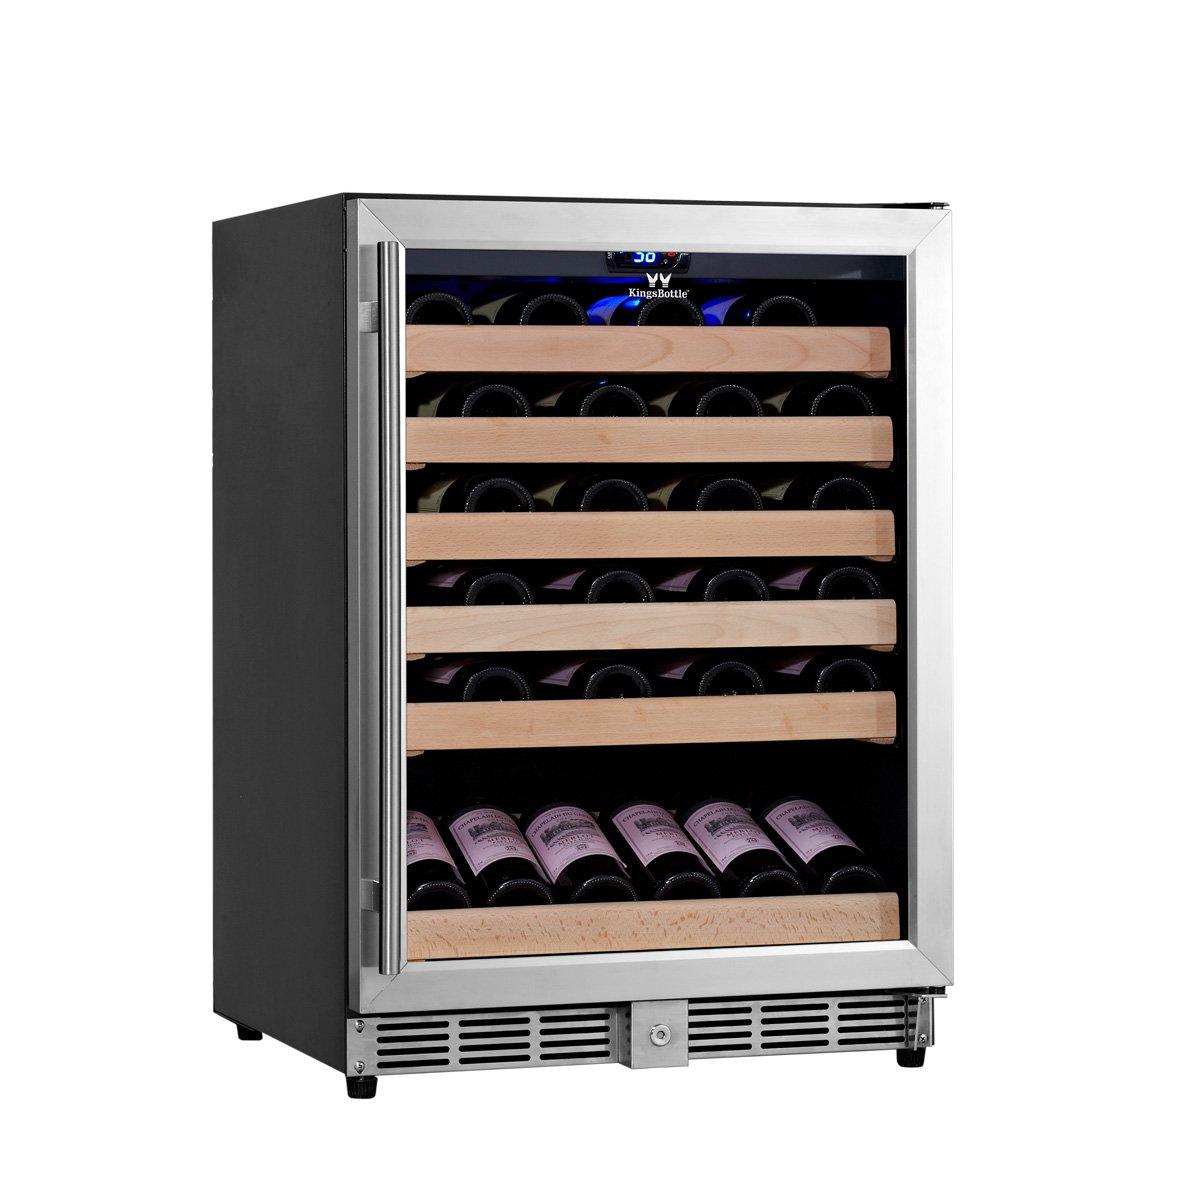 KingsBottle 46 Bottle Single Zone Wine Cooler, Stainless Steel with Glass Door